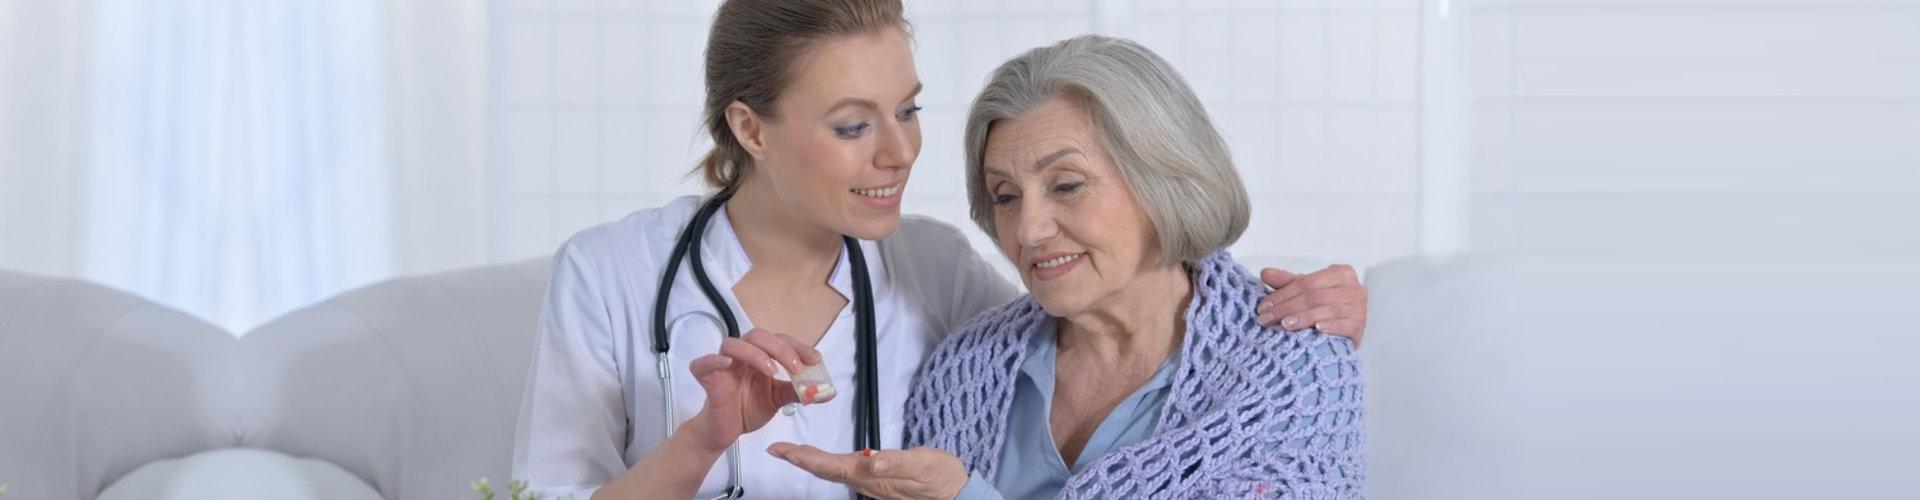 female nurse and senior woman